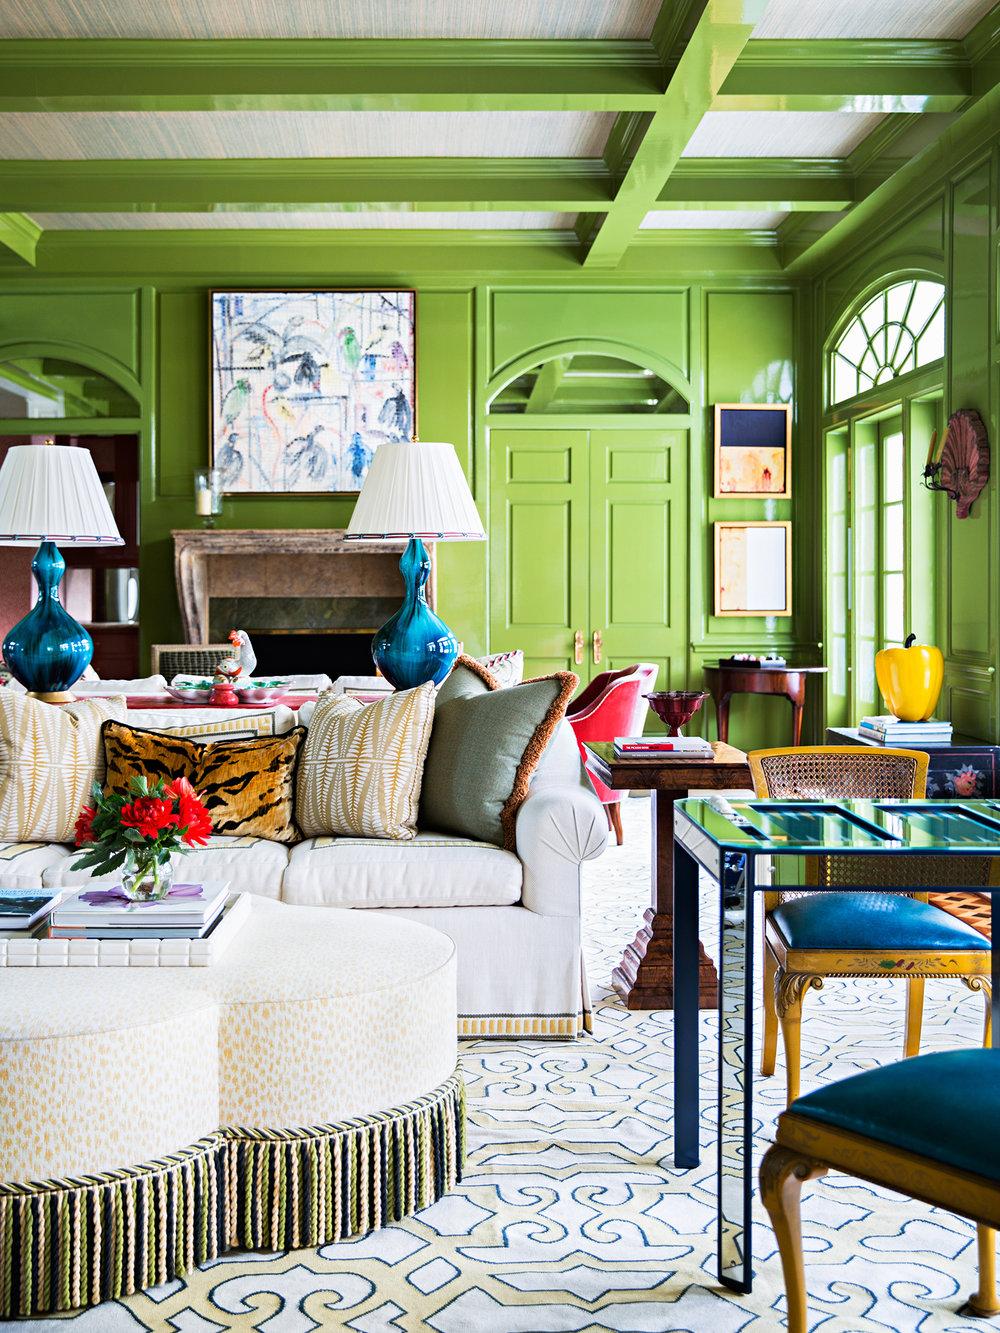 House Beautiful, Photo by: Brittany Ambridge